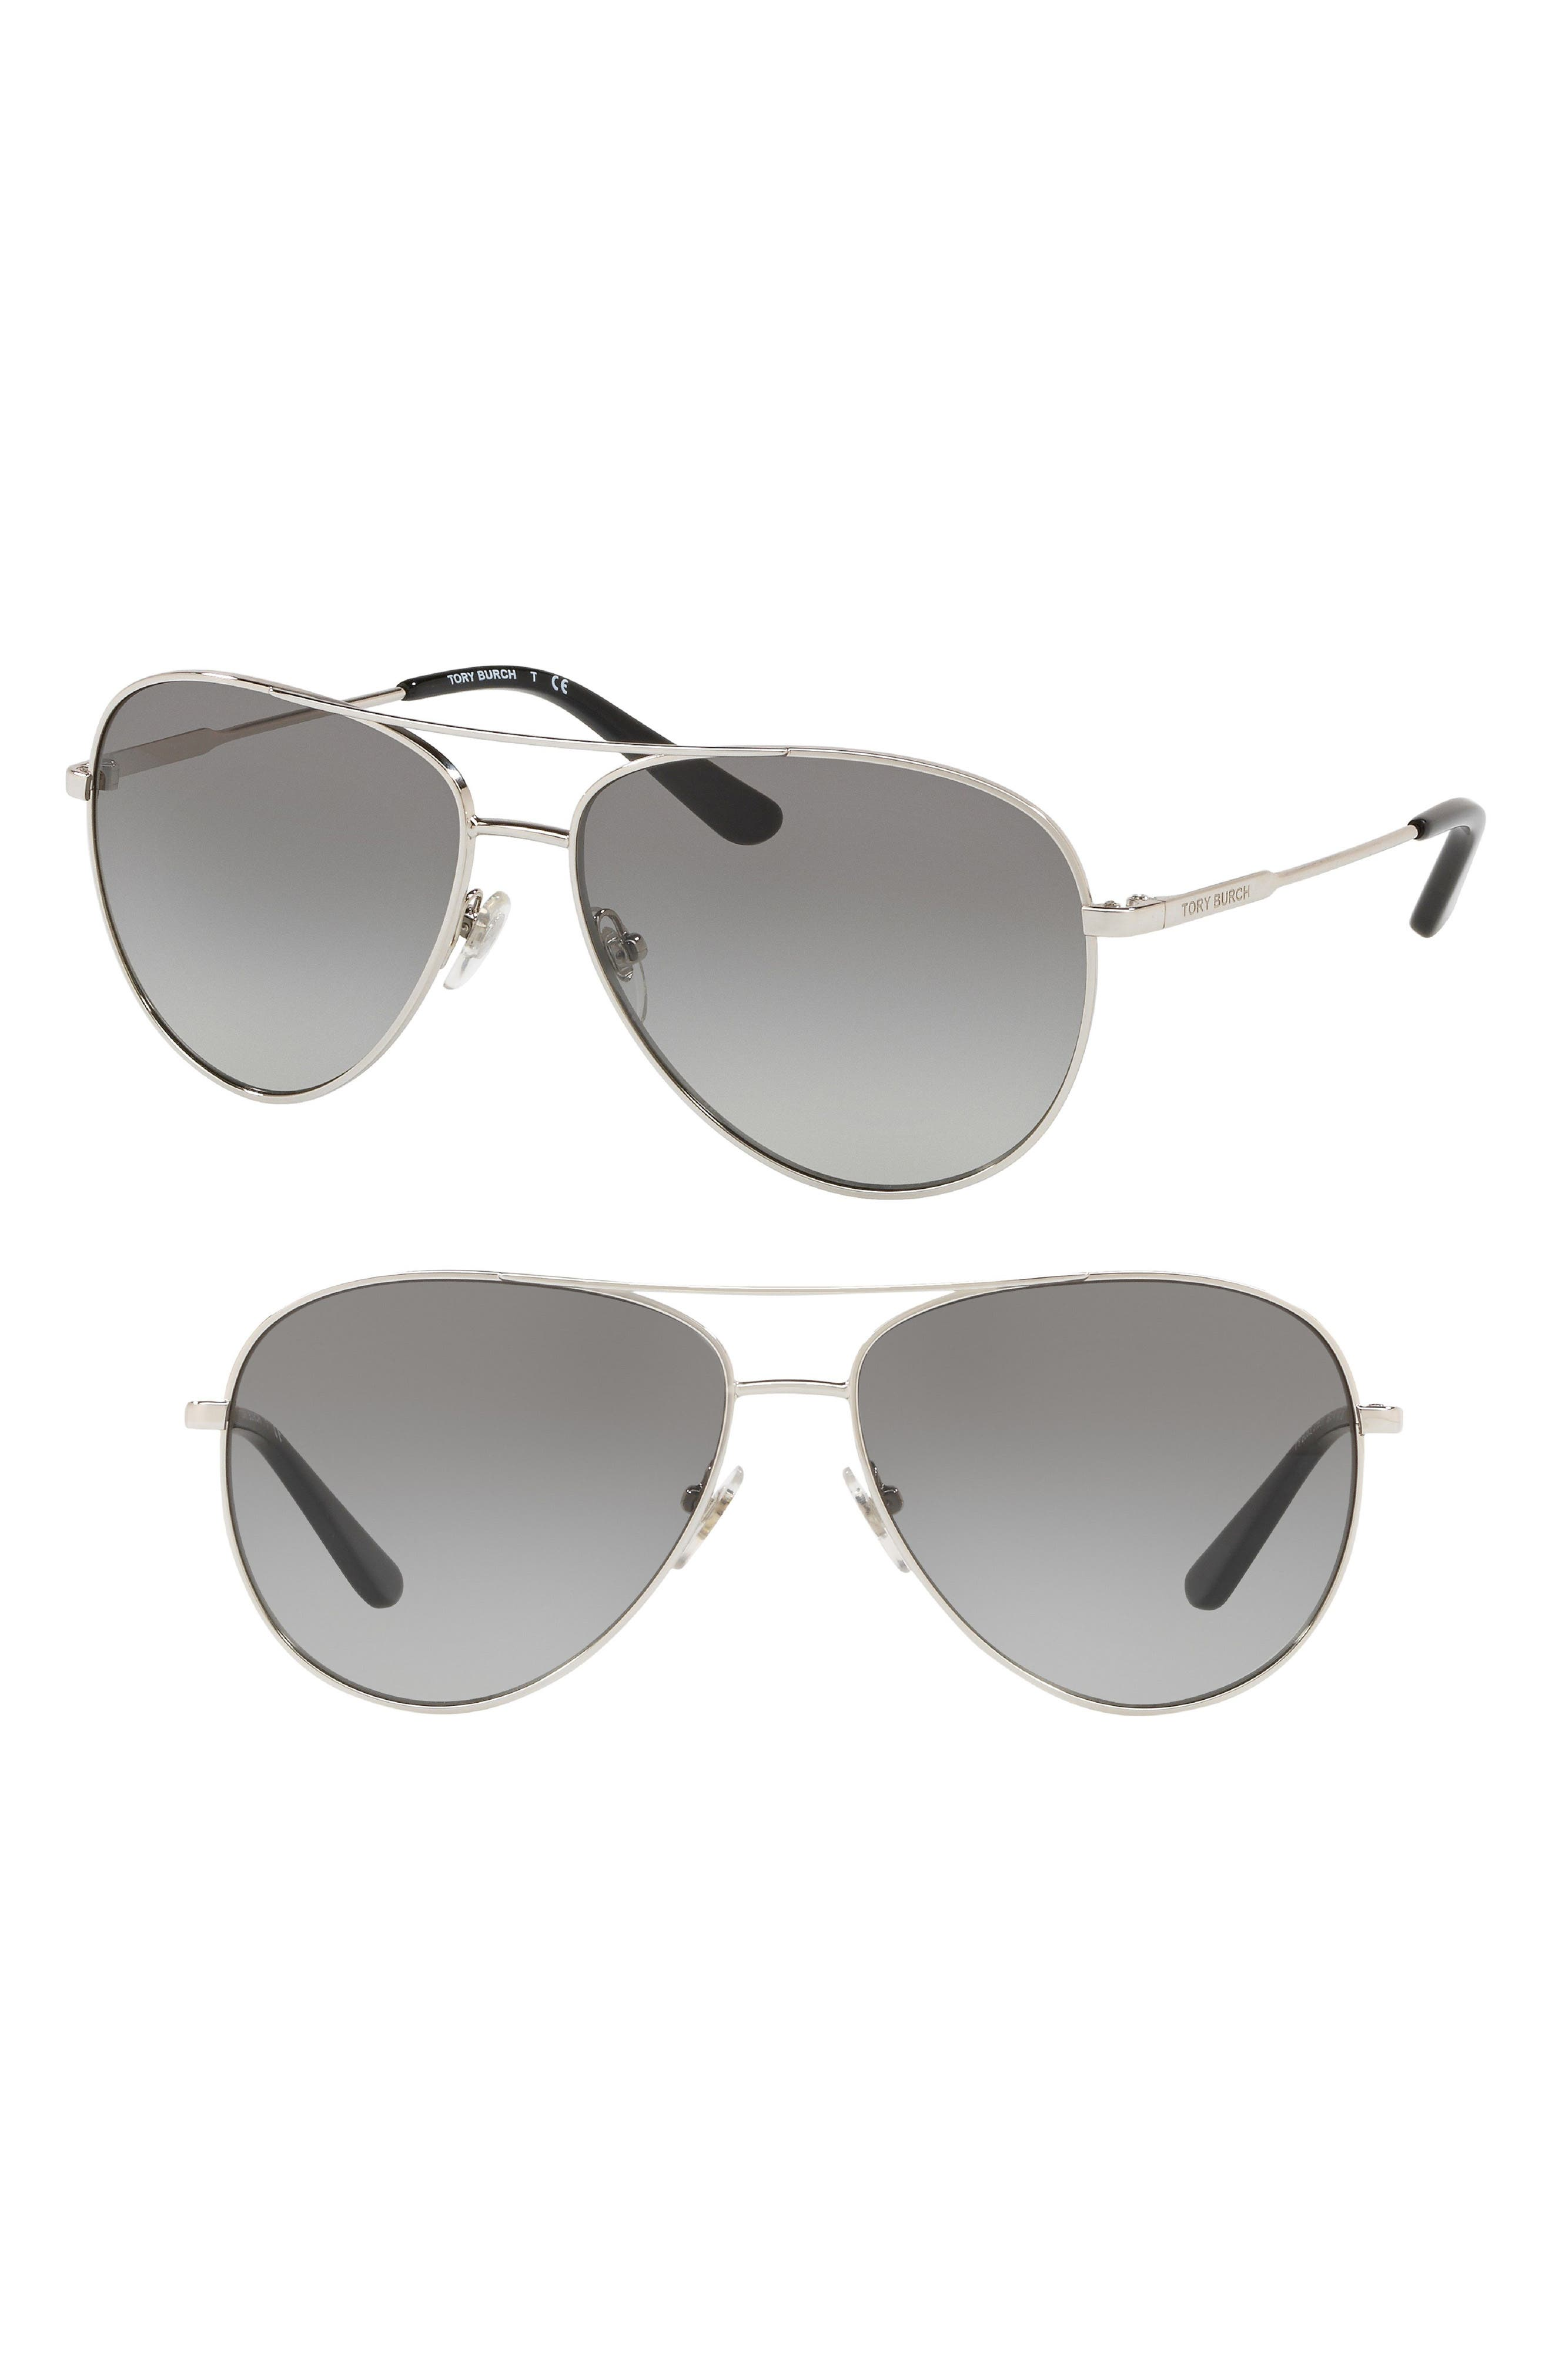 59mm Aviator Sunglasses,                             Main thumbnail 1, color,                             Silver